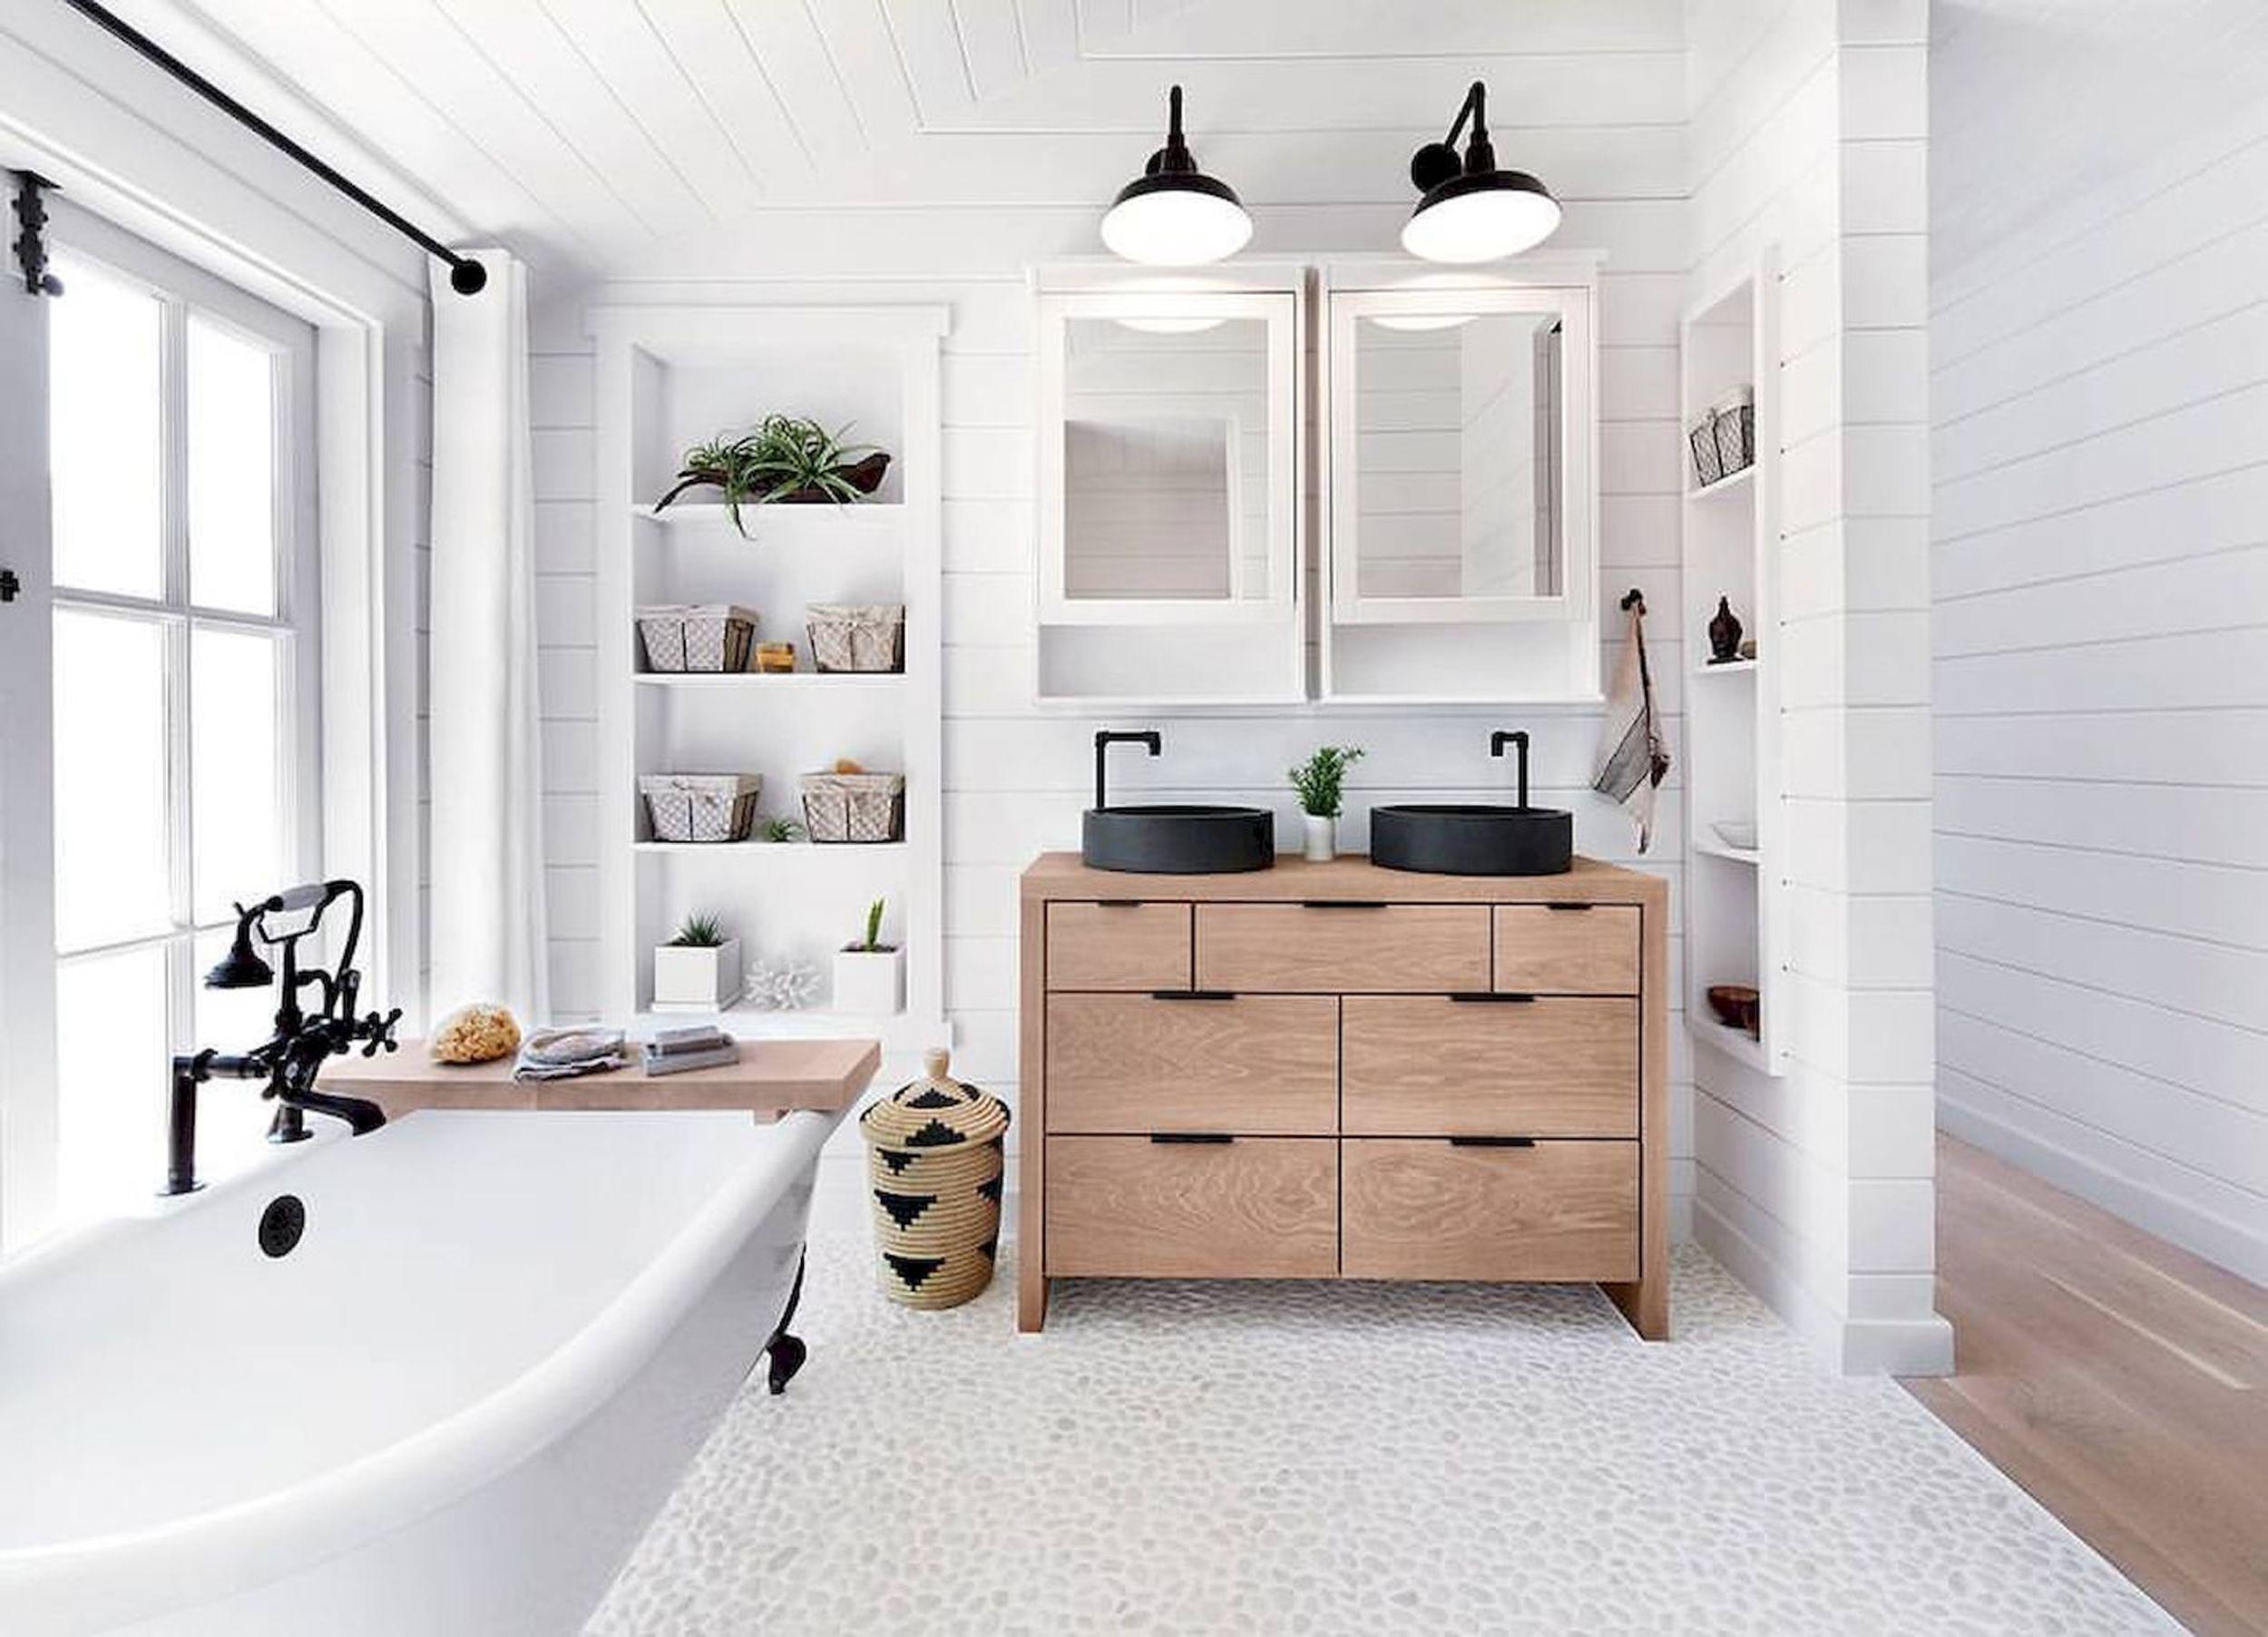 Emily henderson mountain fixer upper rethink the pebble bathrooms